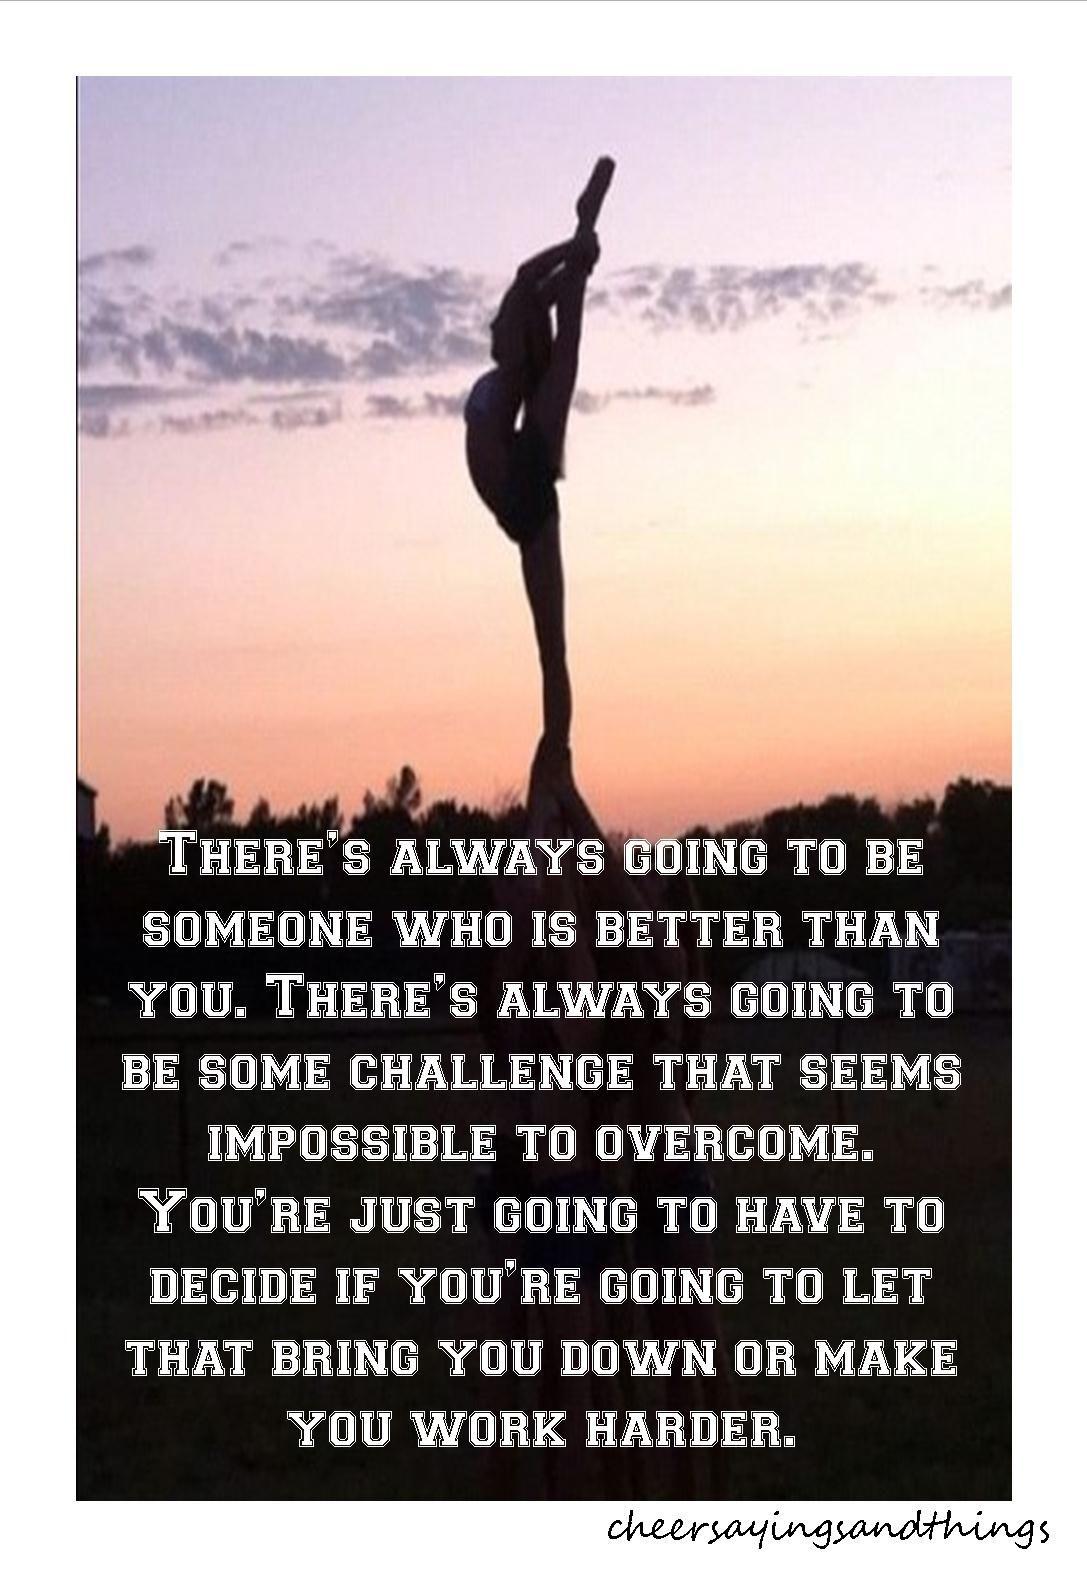 Cheerleading Quotes Tumblr | Cheer Sayings & Things | CHEER ...